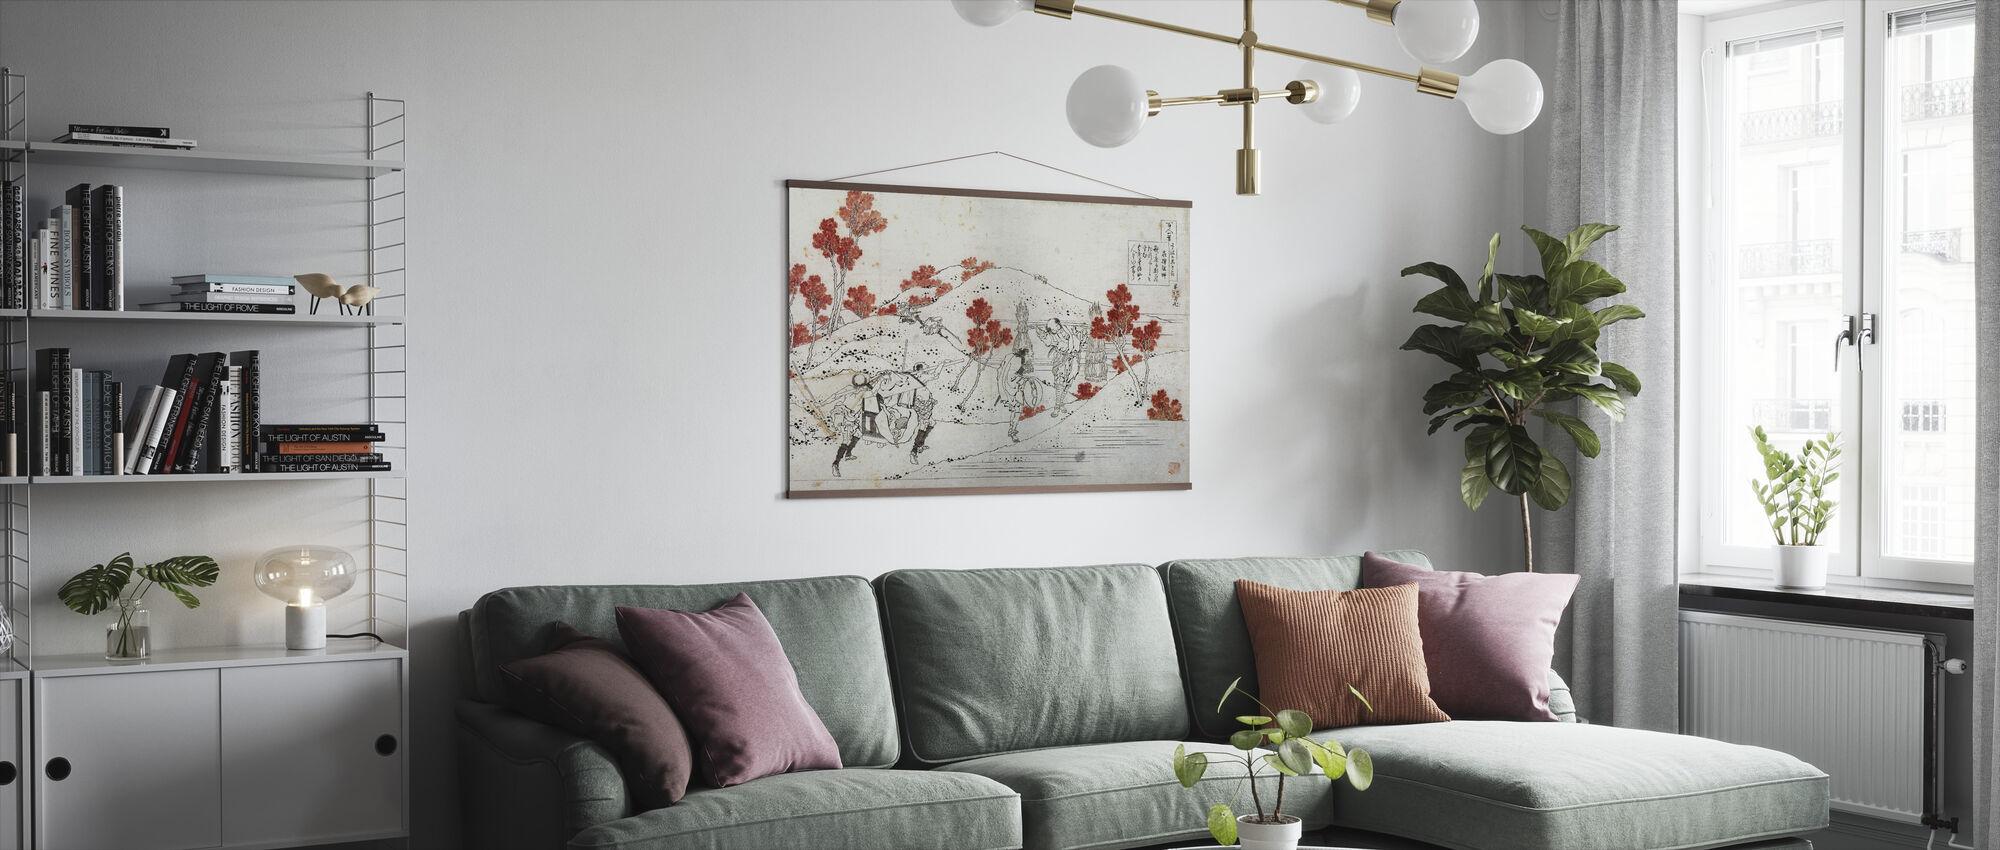 Porters Carry Palanquin, Katsushika Hokusai - Juliste - Olohuone